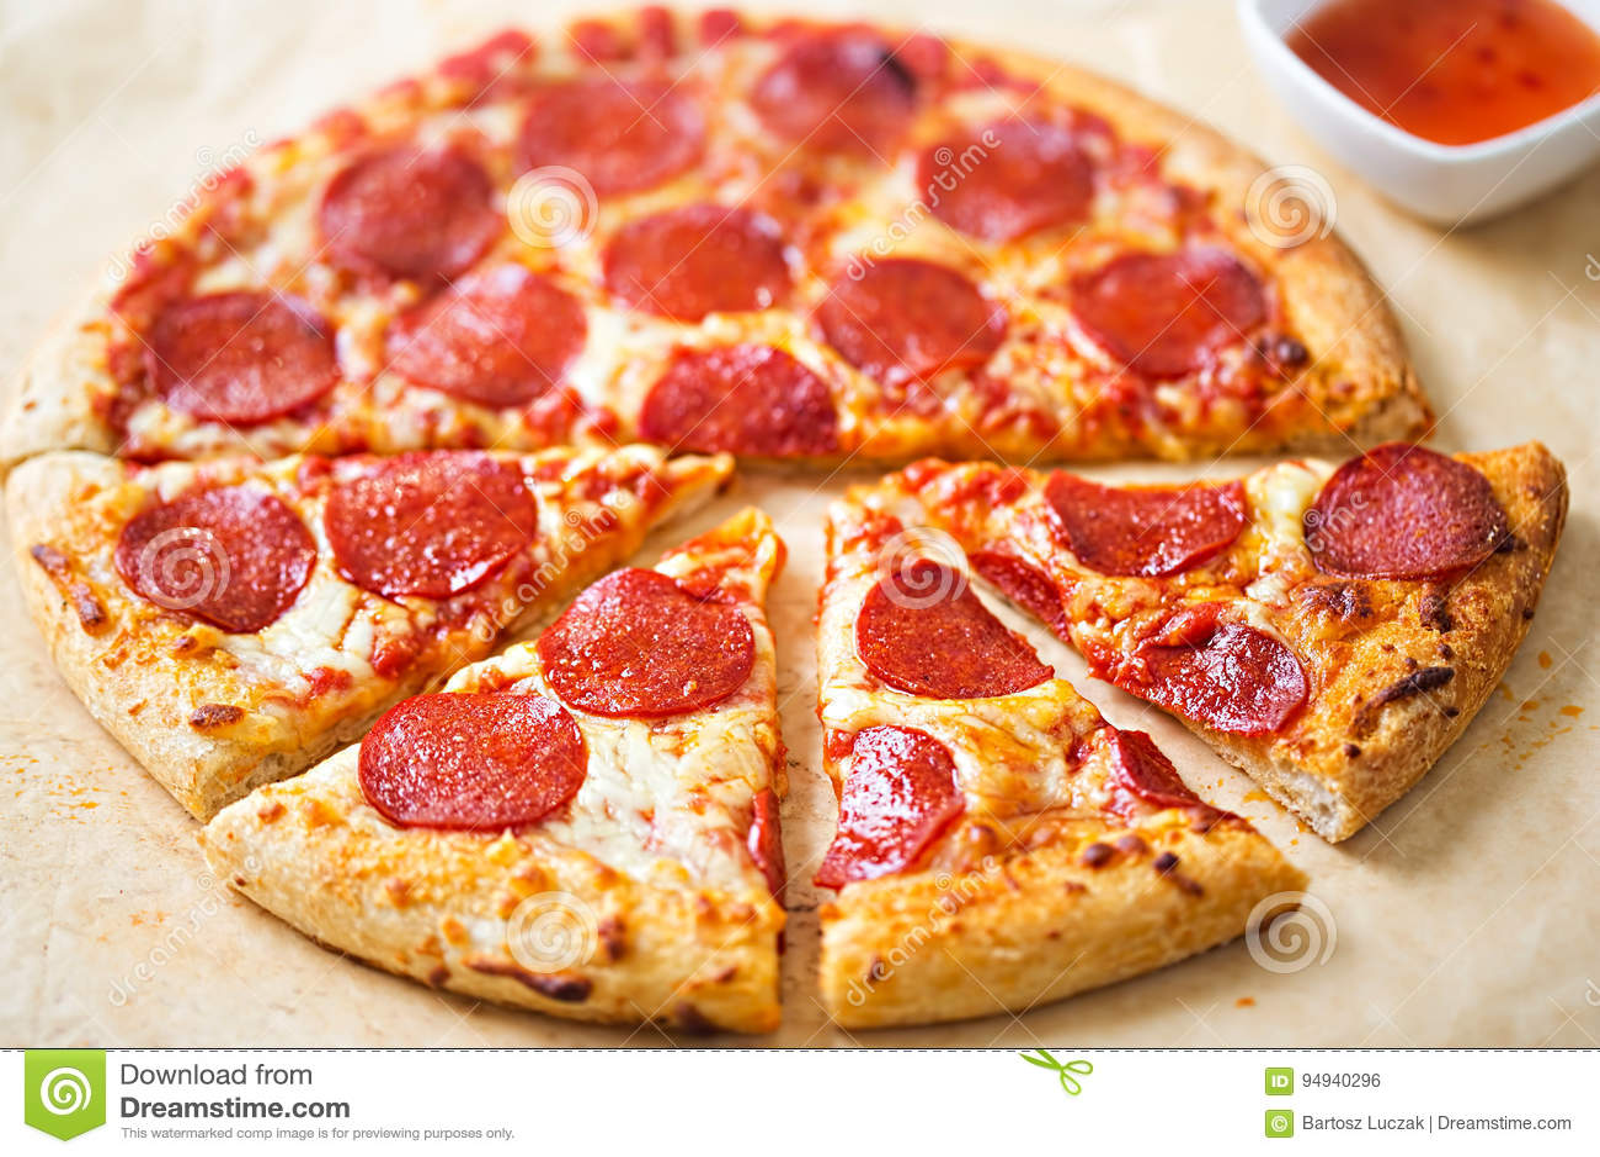 Pepperonipizza mit Paprikabad